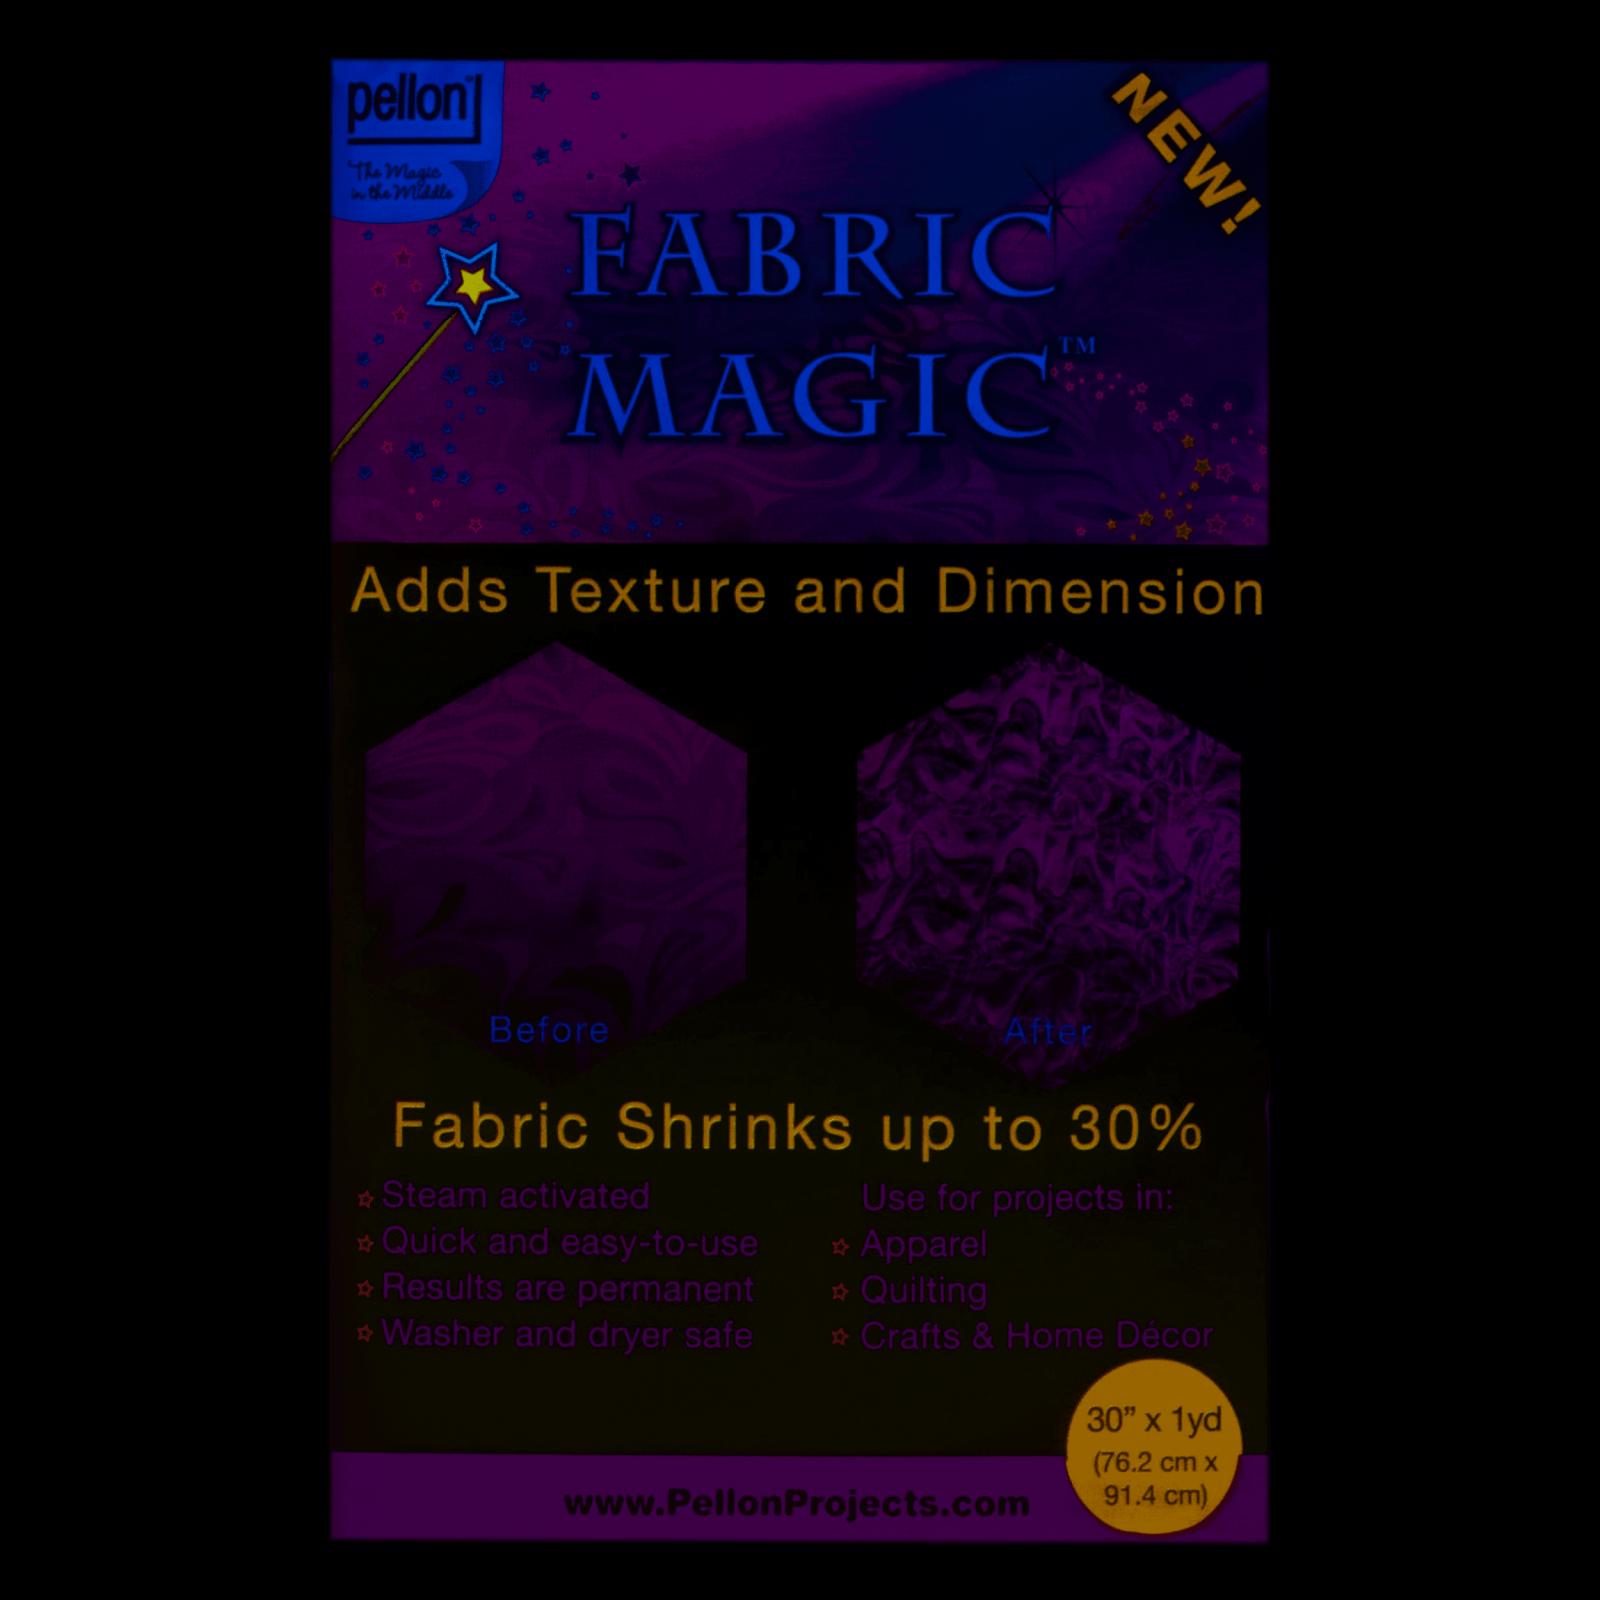 PELLON FABRIC MAGIC 30x1yd